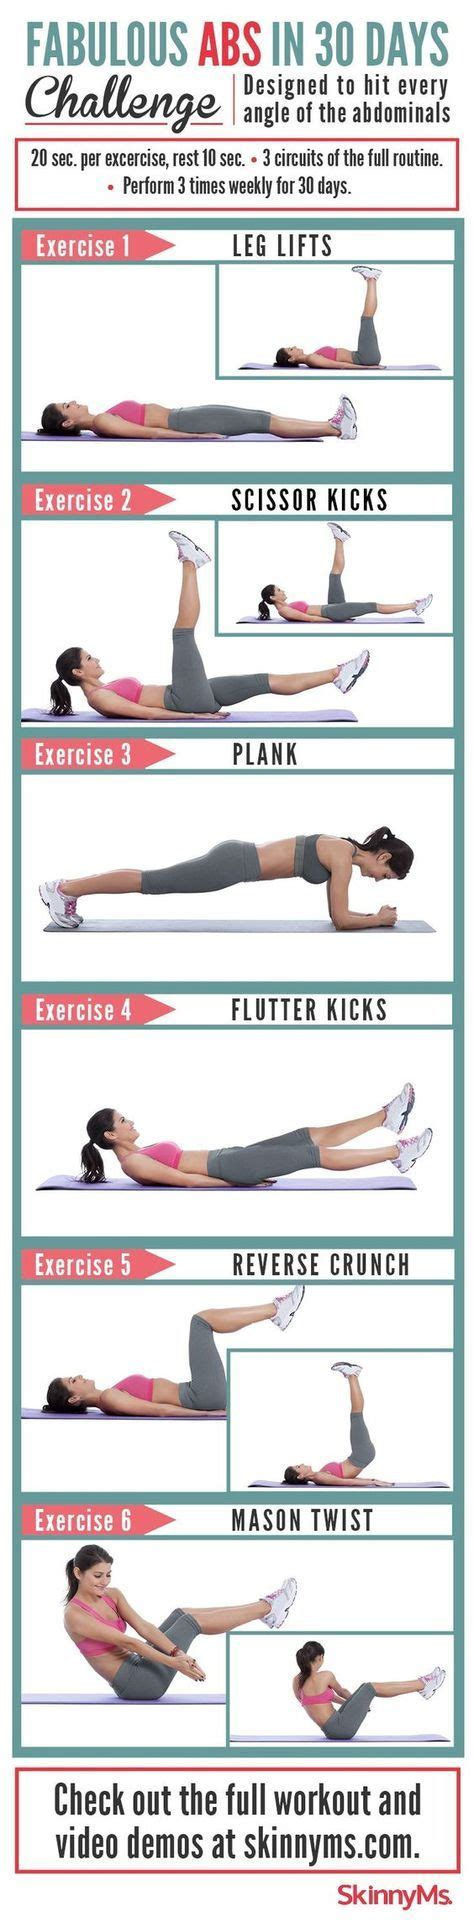 pilates 30 day challenge best 25 21 day challenge ideas on 21 day